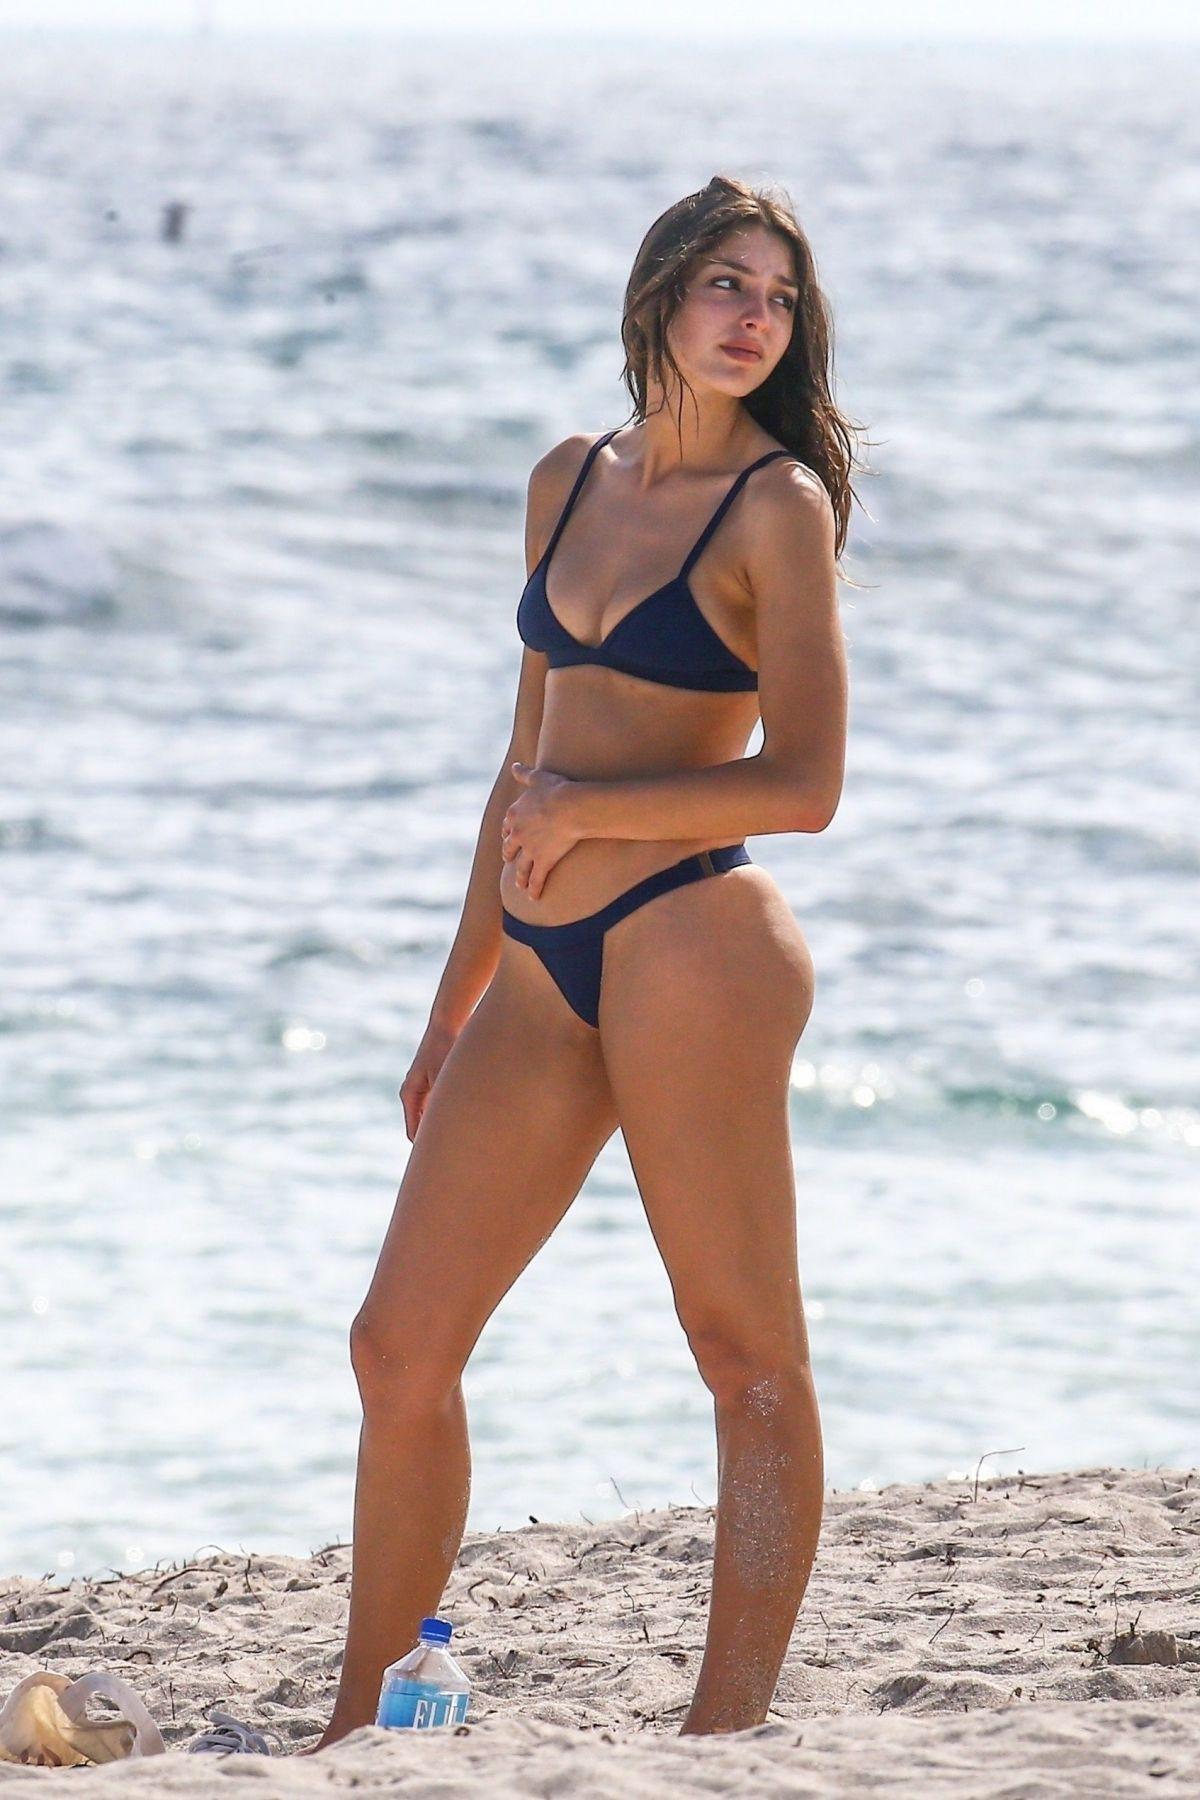 Casey Martin in Black Bikini on the beach in Santa Monica Pic 6 of 35